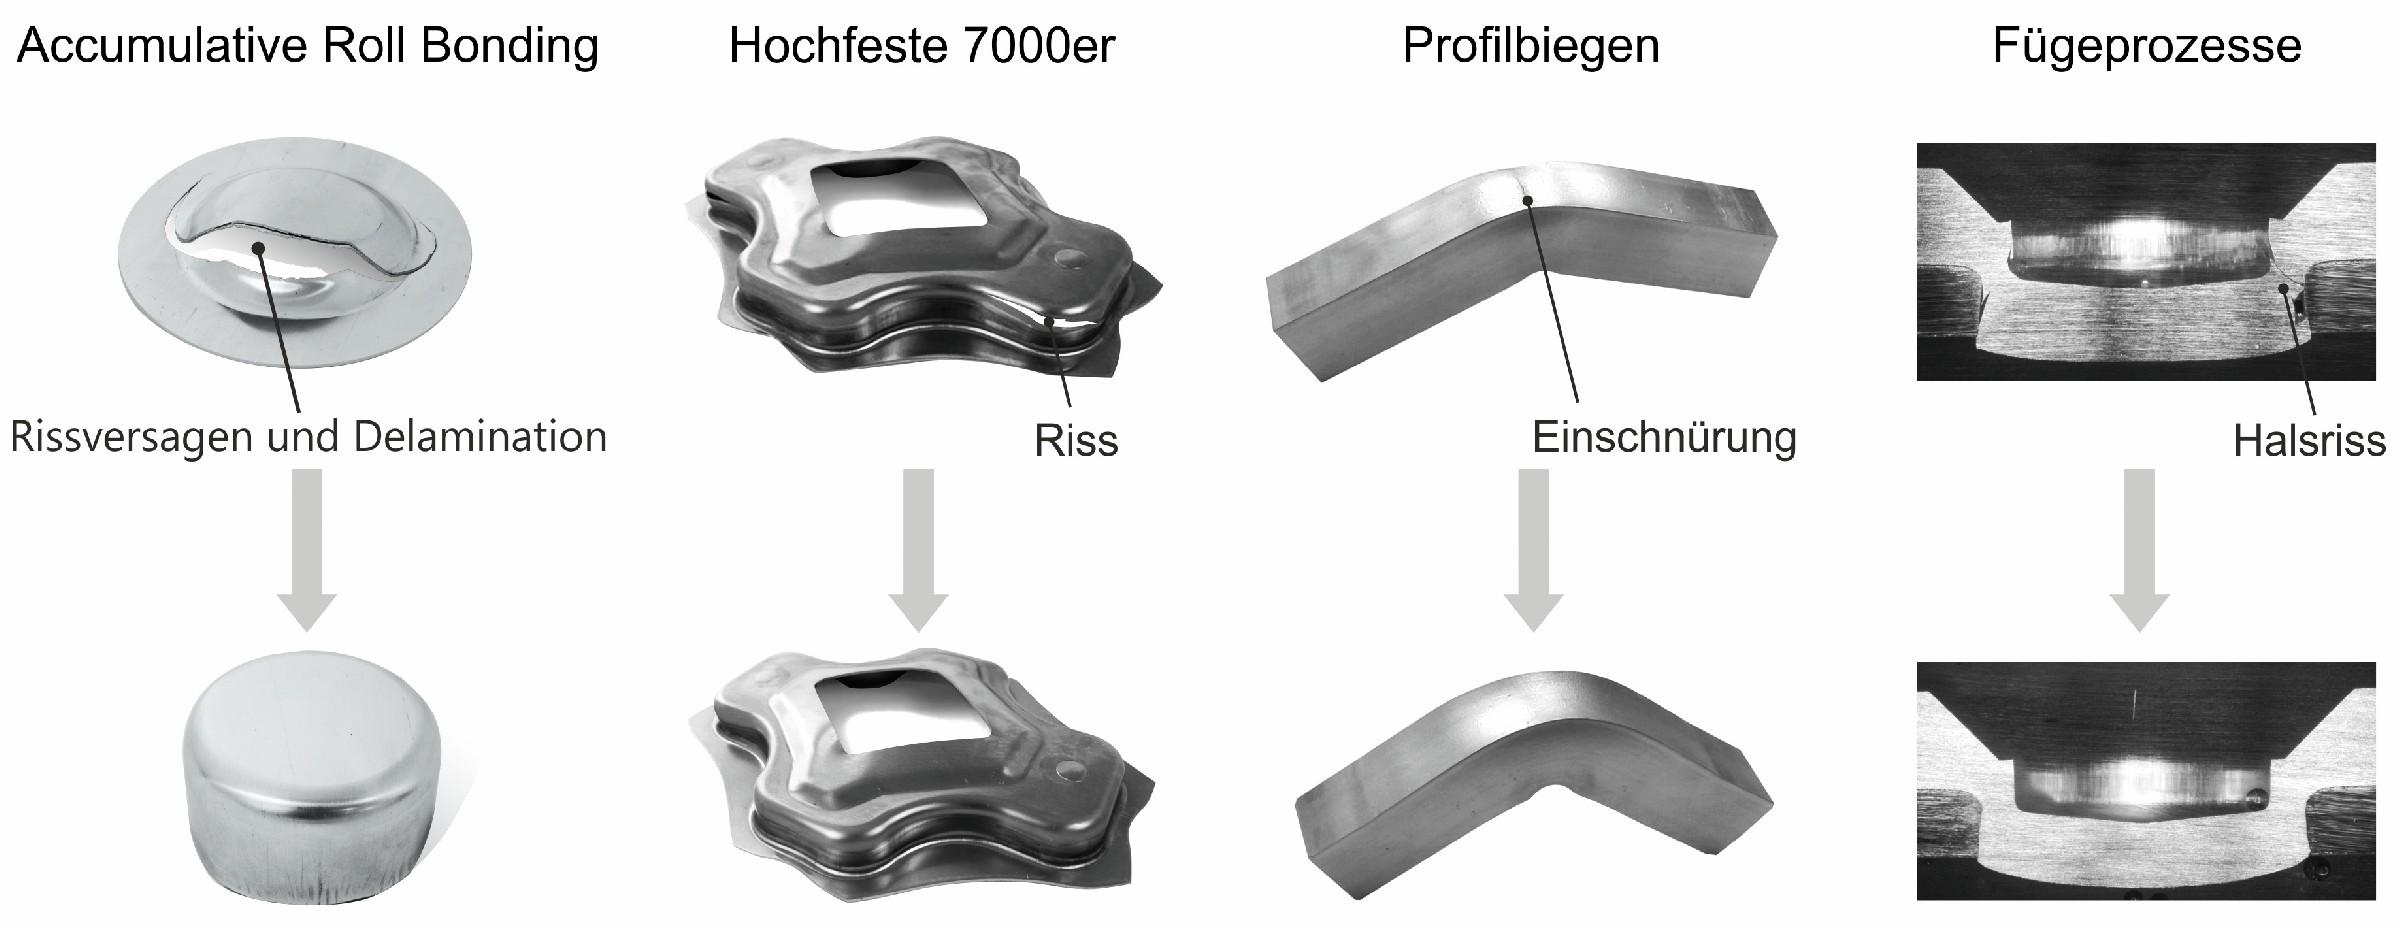 Bild 4 Einsatzbereiche maßgeschneiderter Aluminiumhalbzeuge. Bild: Friedrich-Alexander-Universität Erlangen-Nürnberg